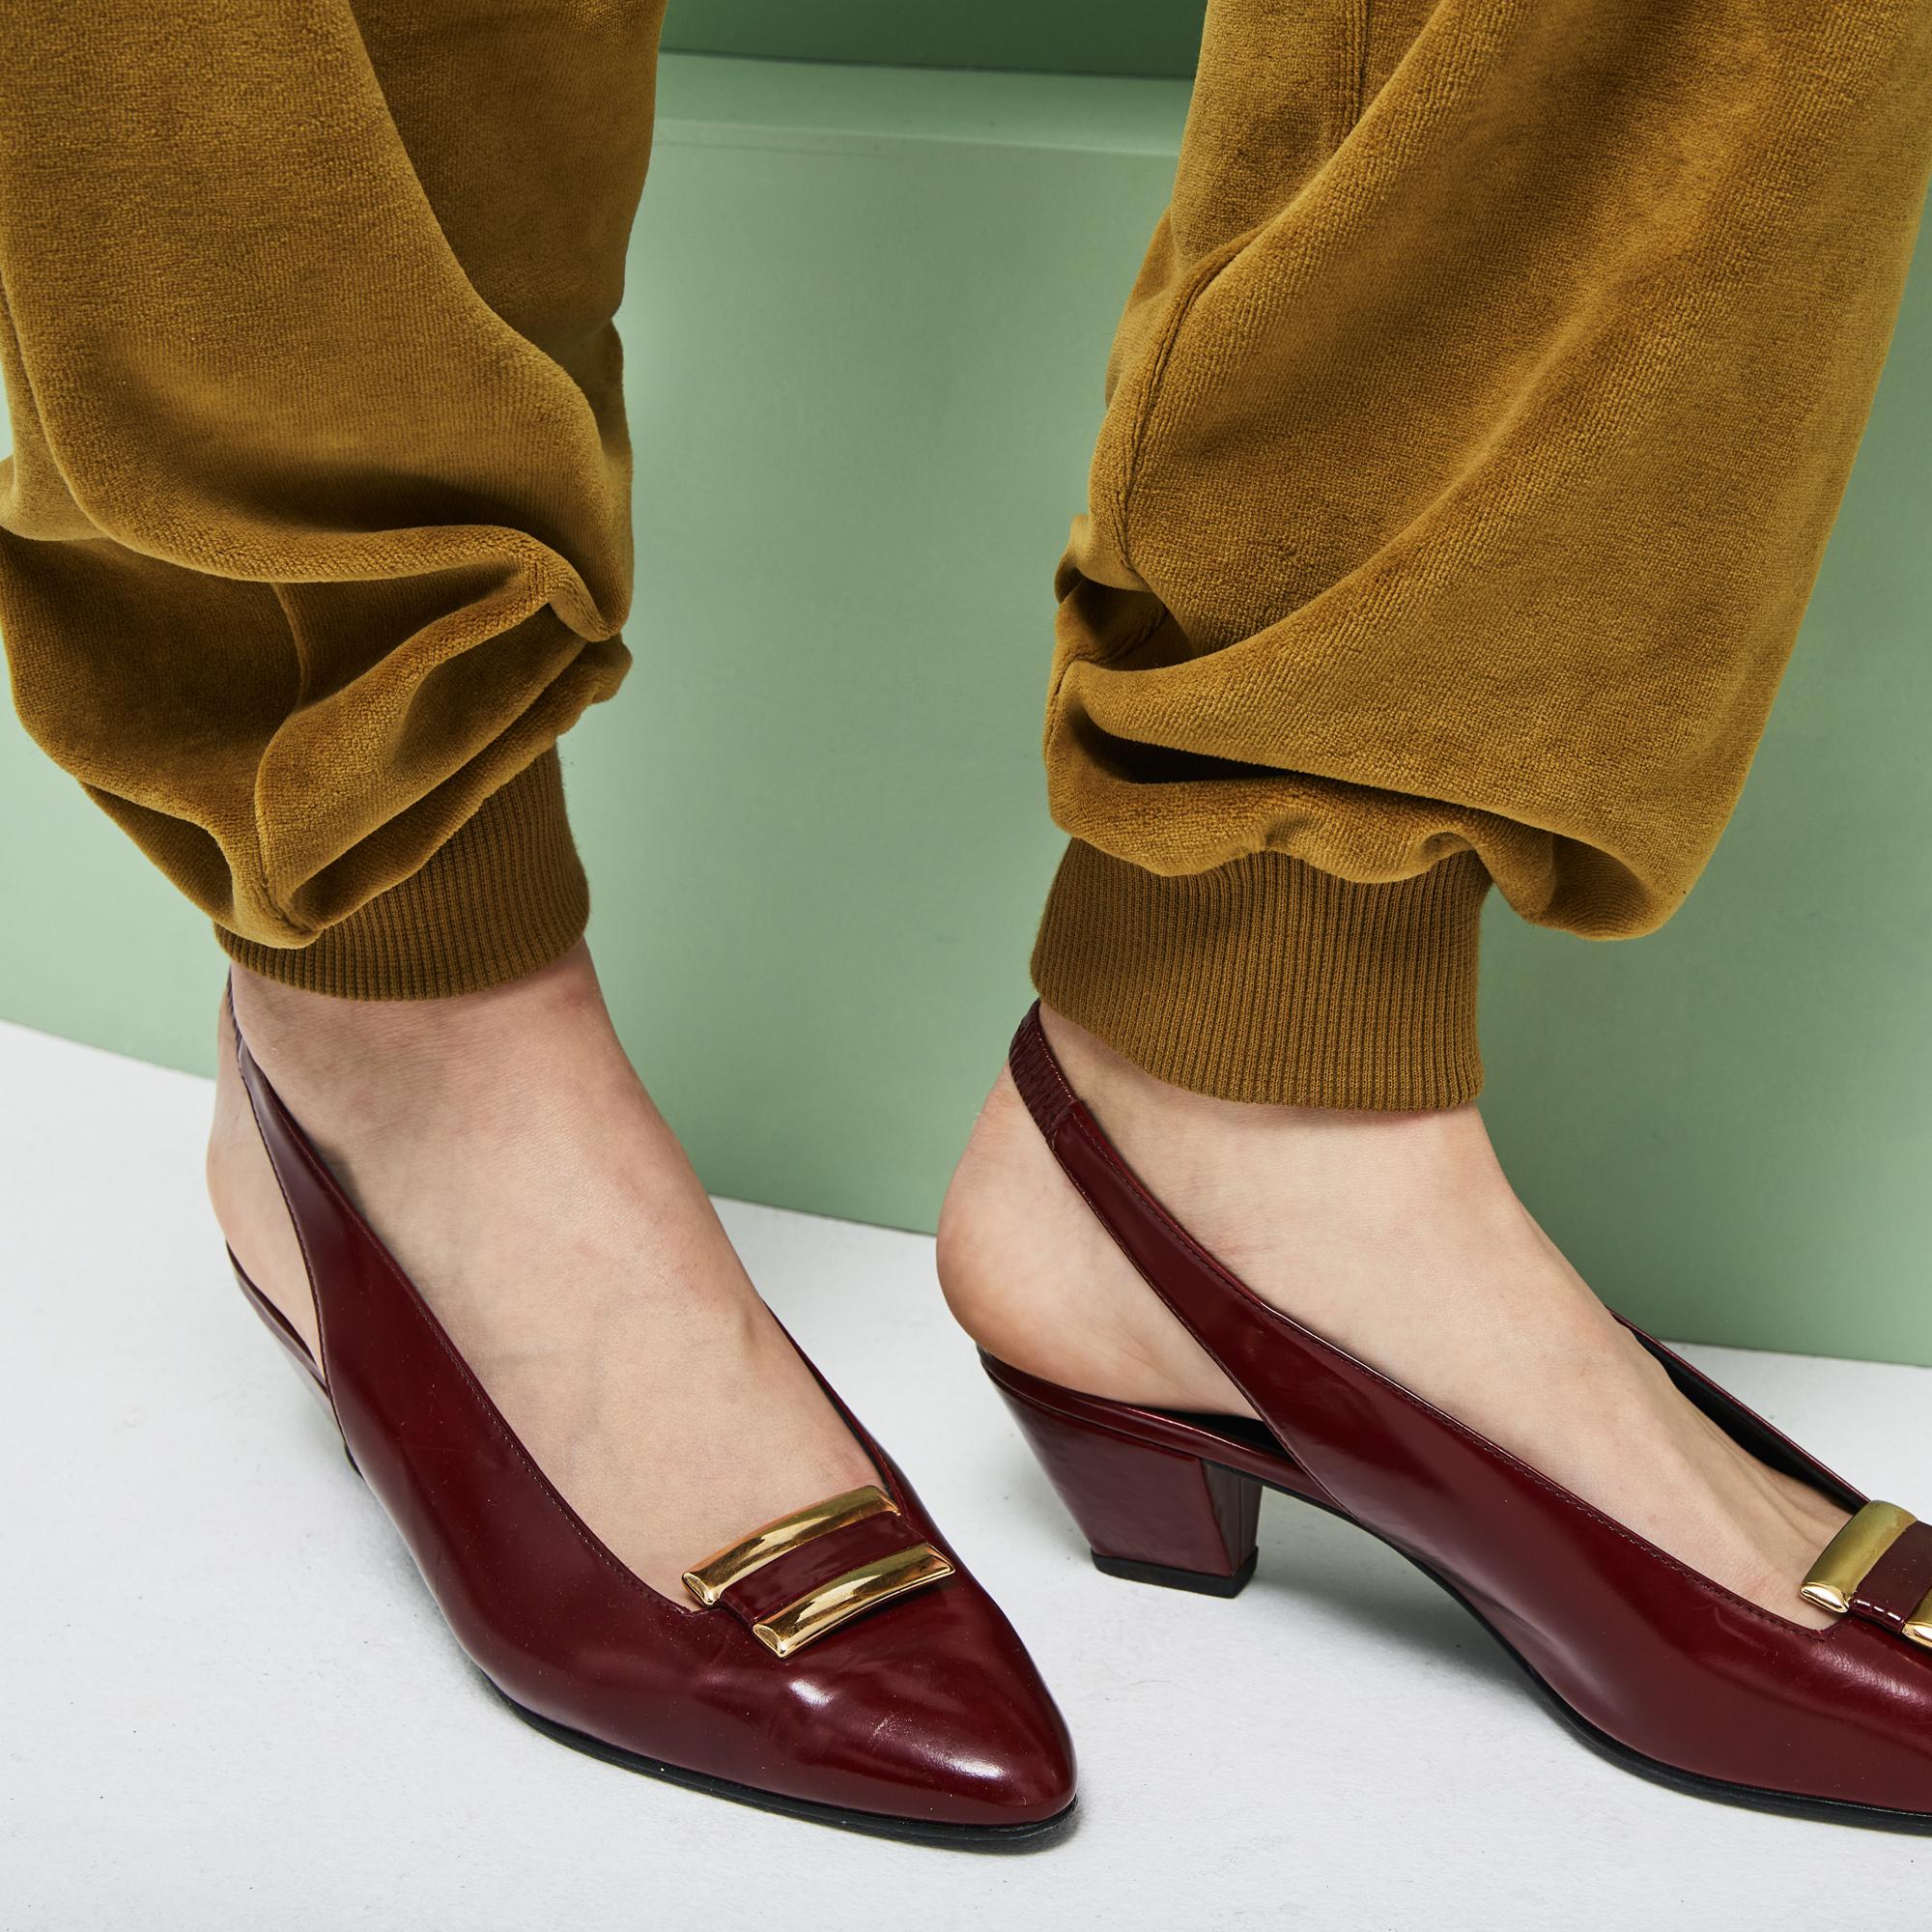 Фото 5 - Спортивные штаны Lacoste коричневого цвета